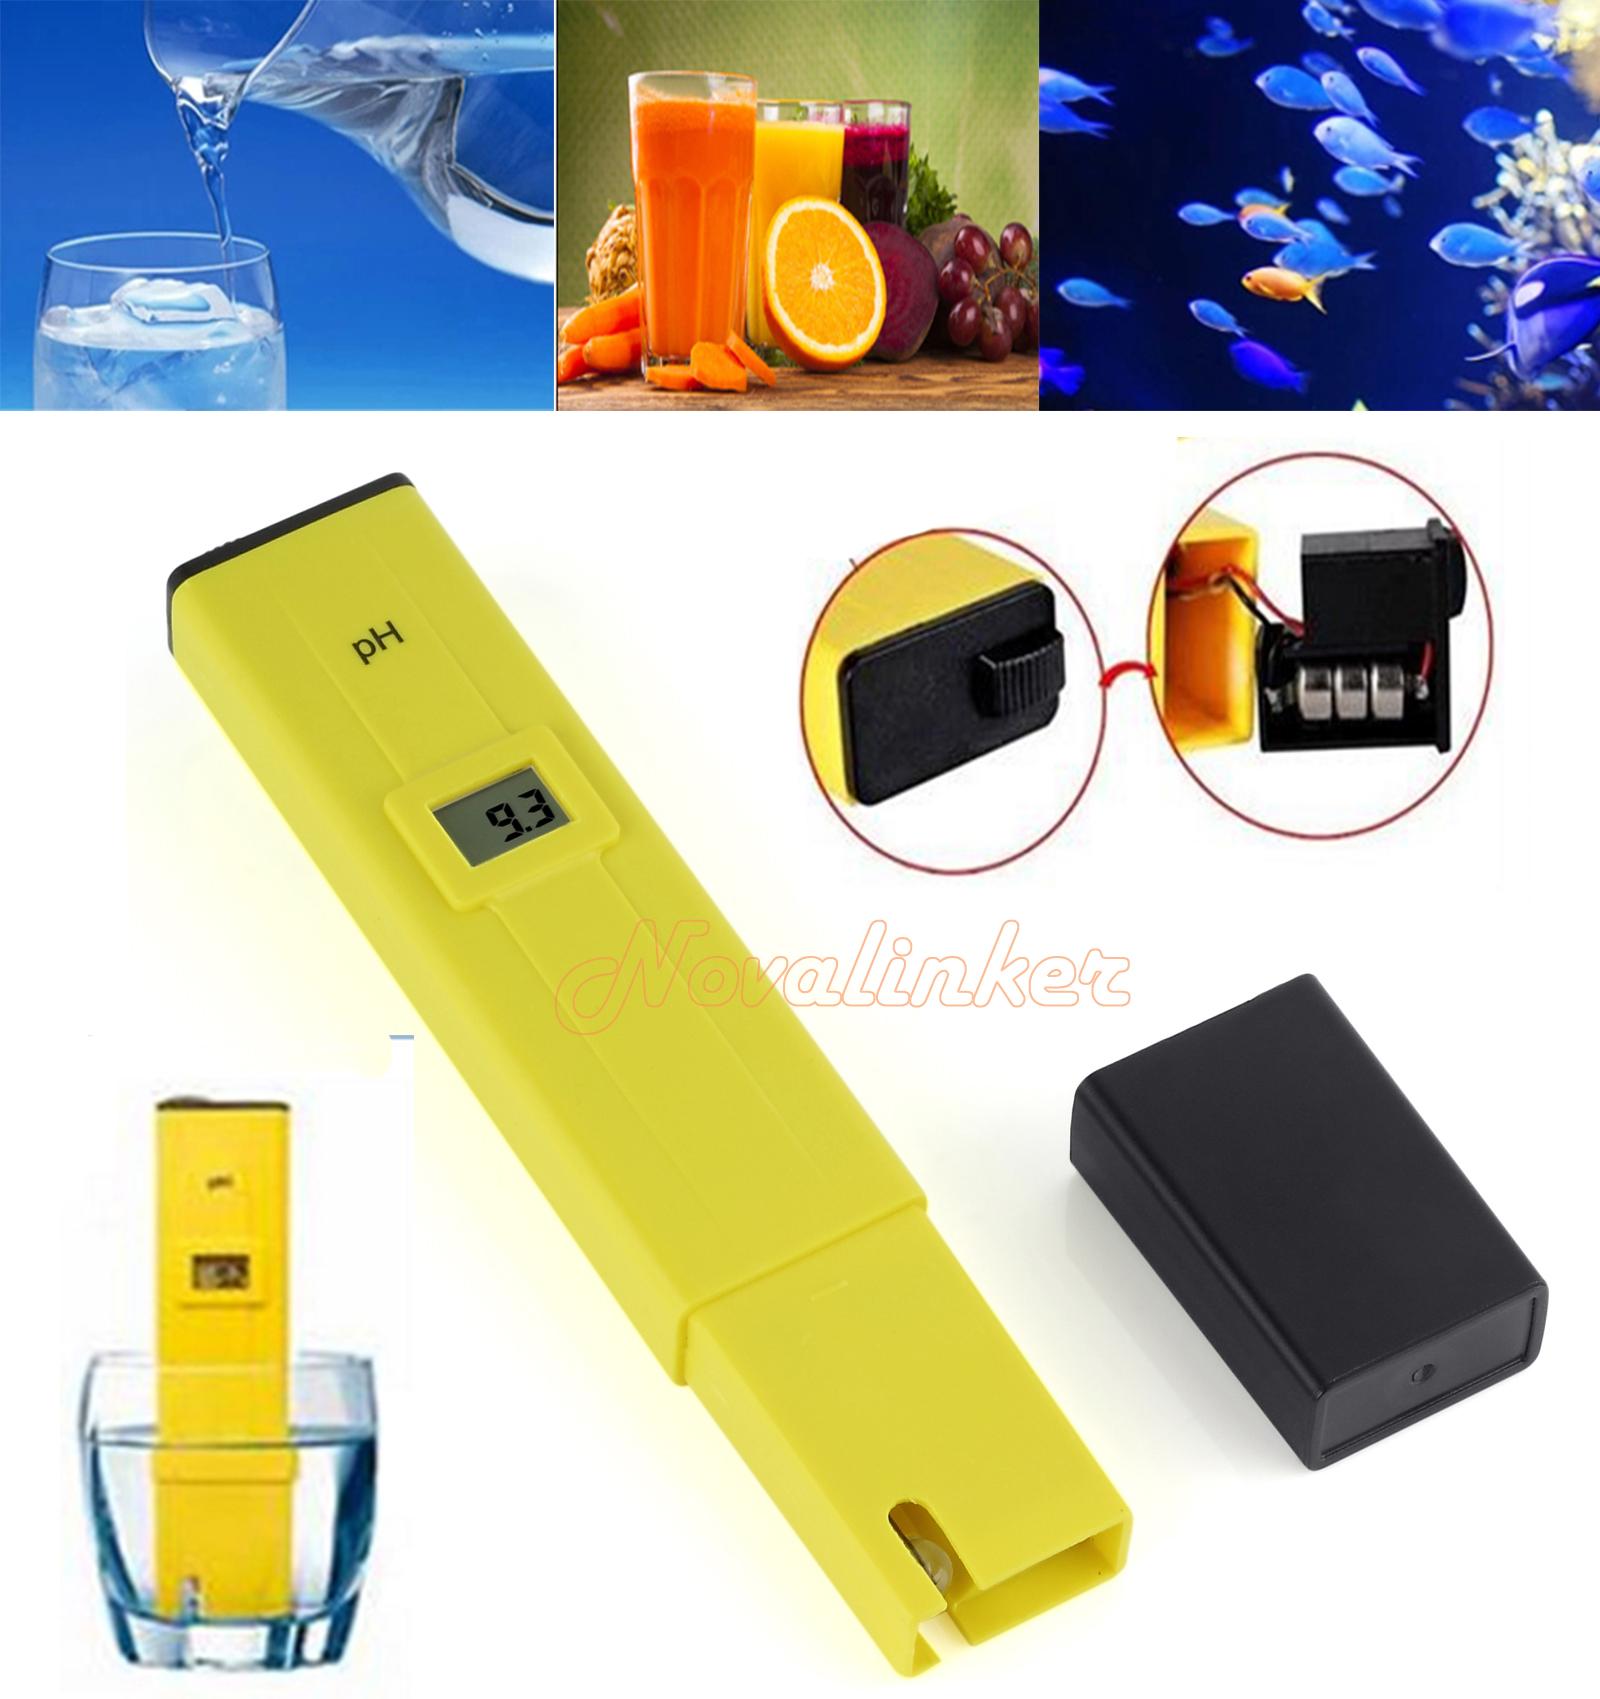 Digital Ph Meter Tester Portable Water Hydroponics Pen Pool Aquarium Test Kit Au Ebay